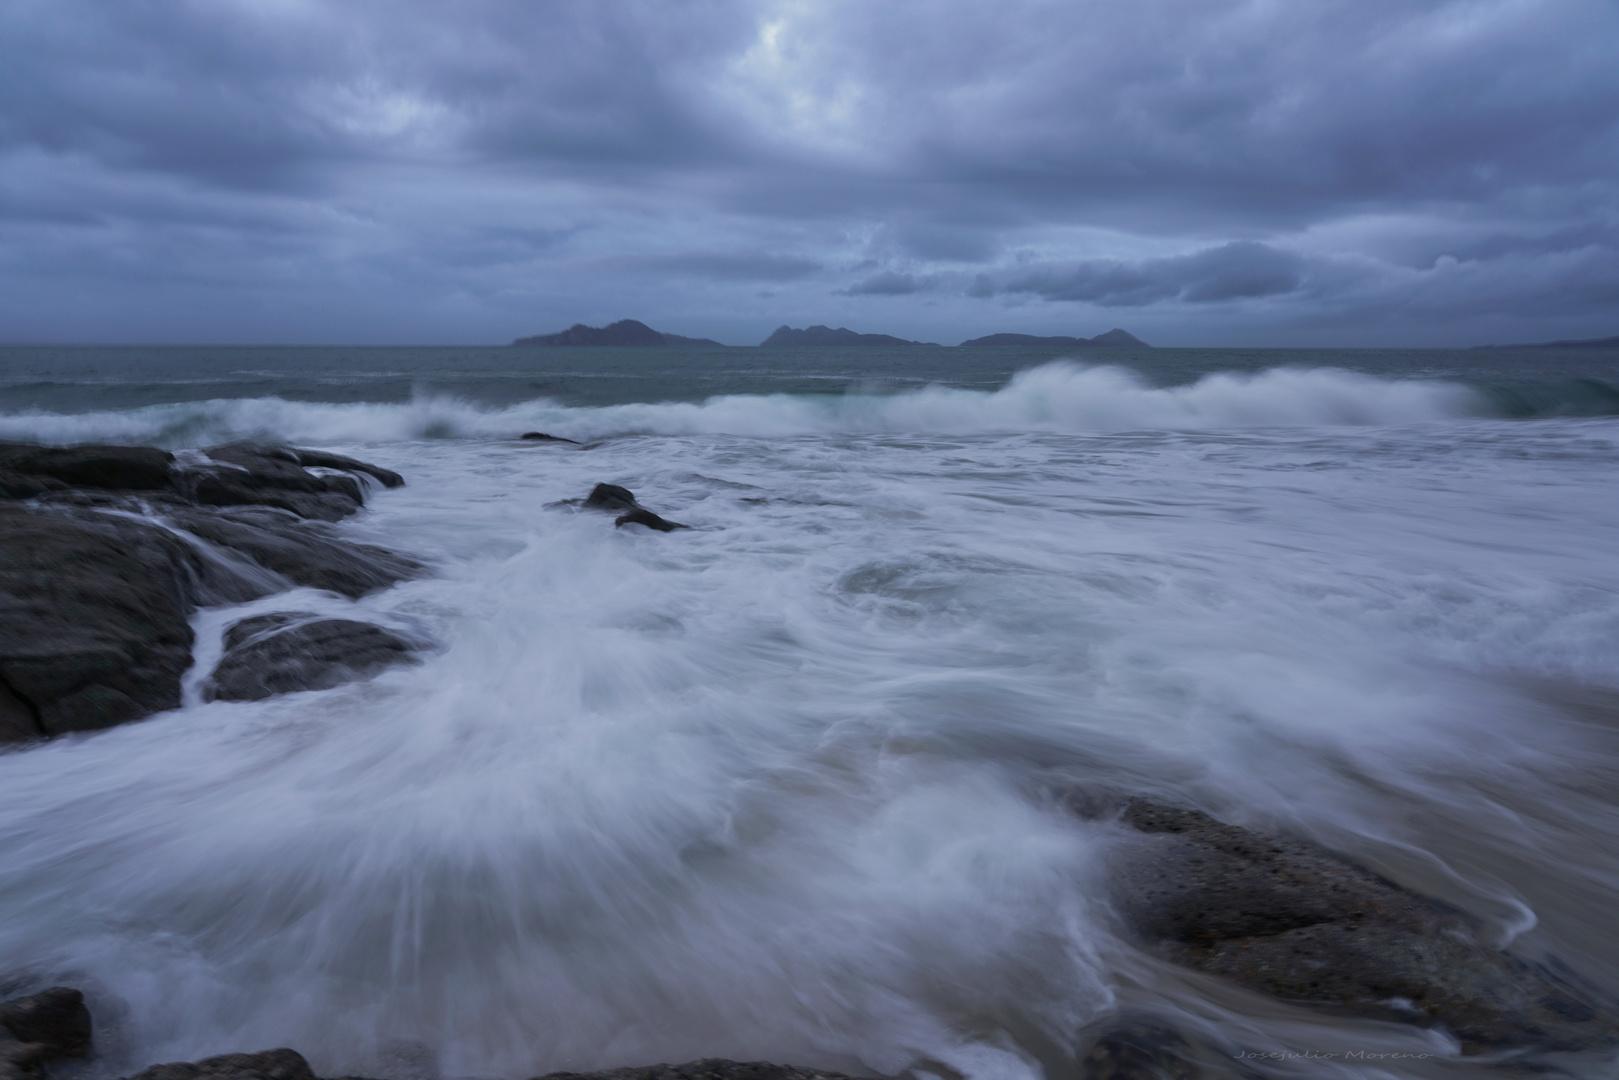 agua y seda, Saians (Pontevedra)